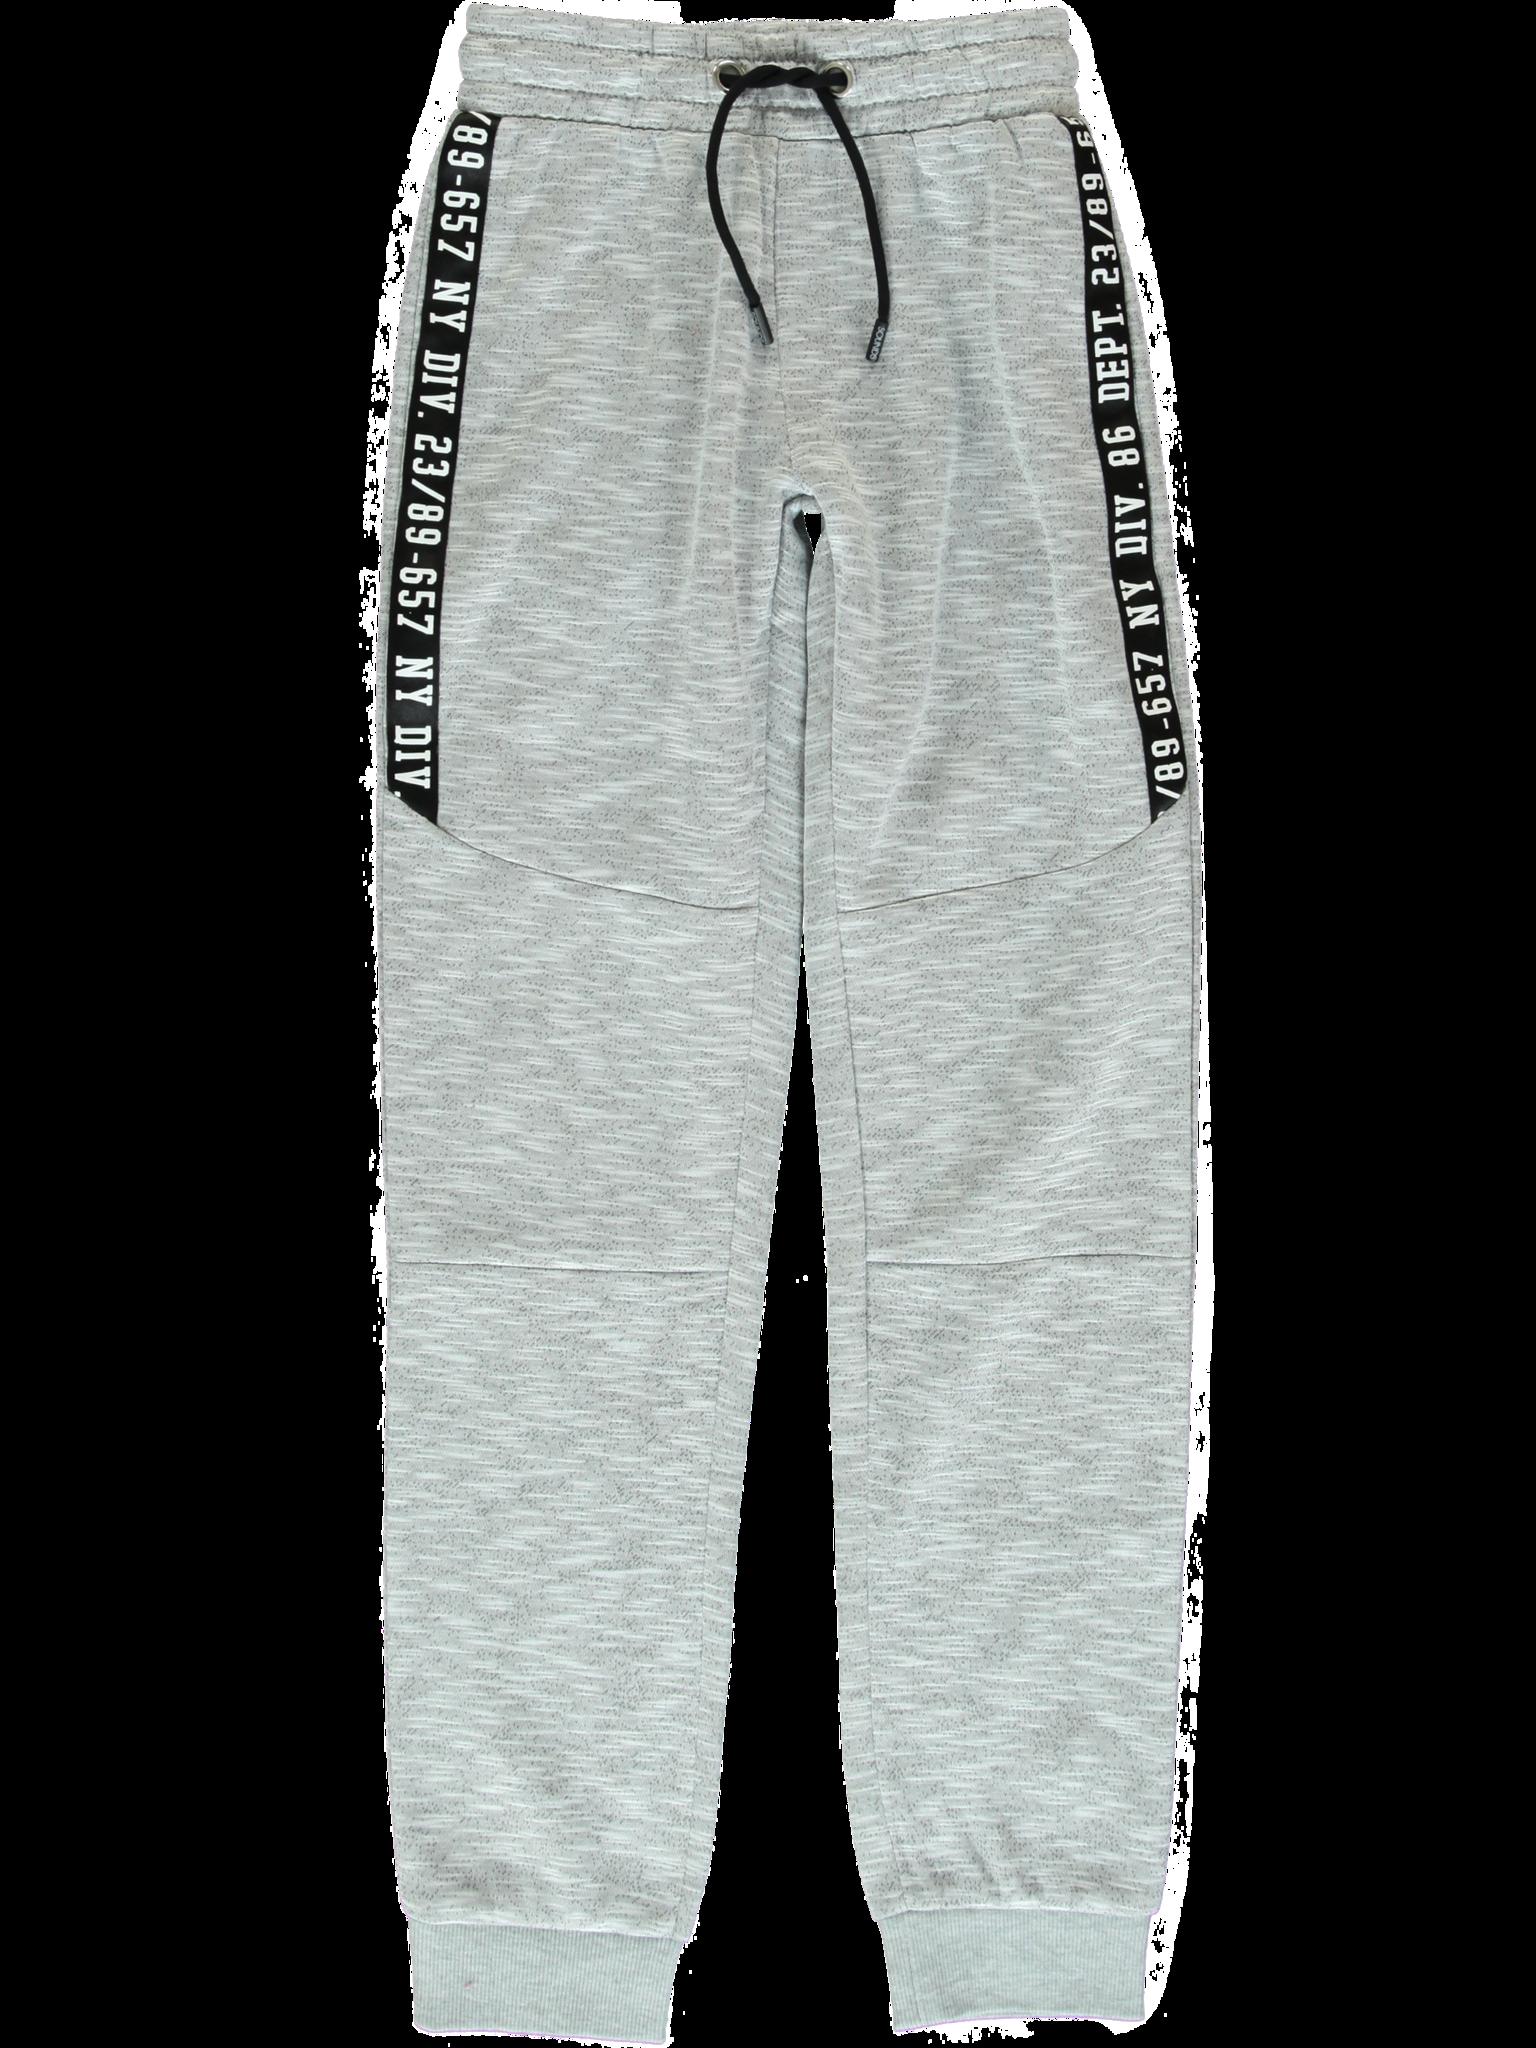 All Brands | Winterproducts Teen Boys | Jogging Pant | 20 pcs/box